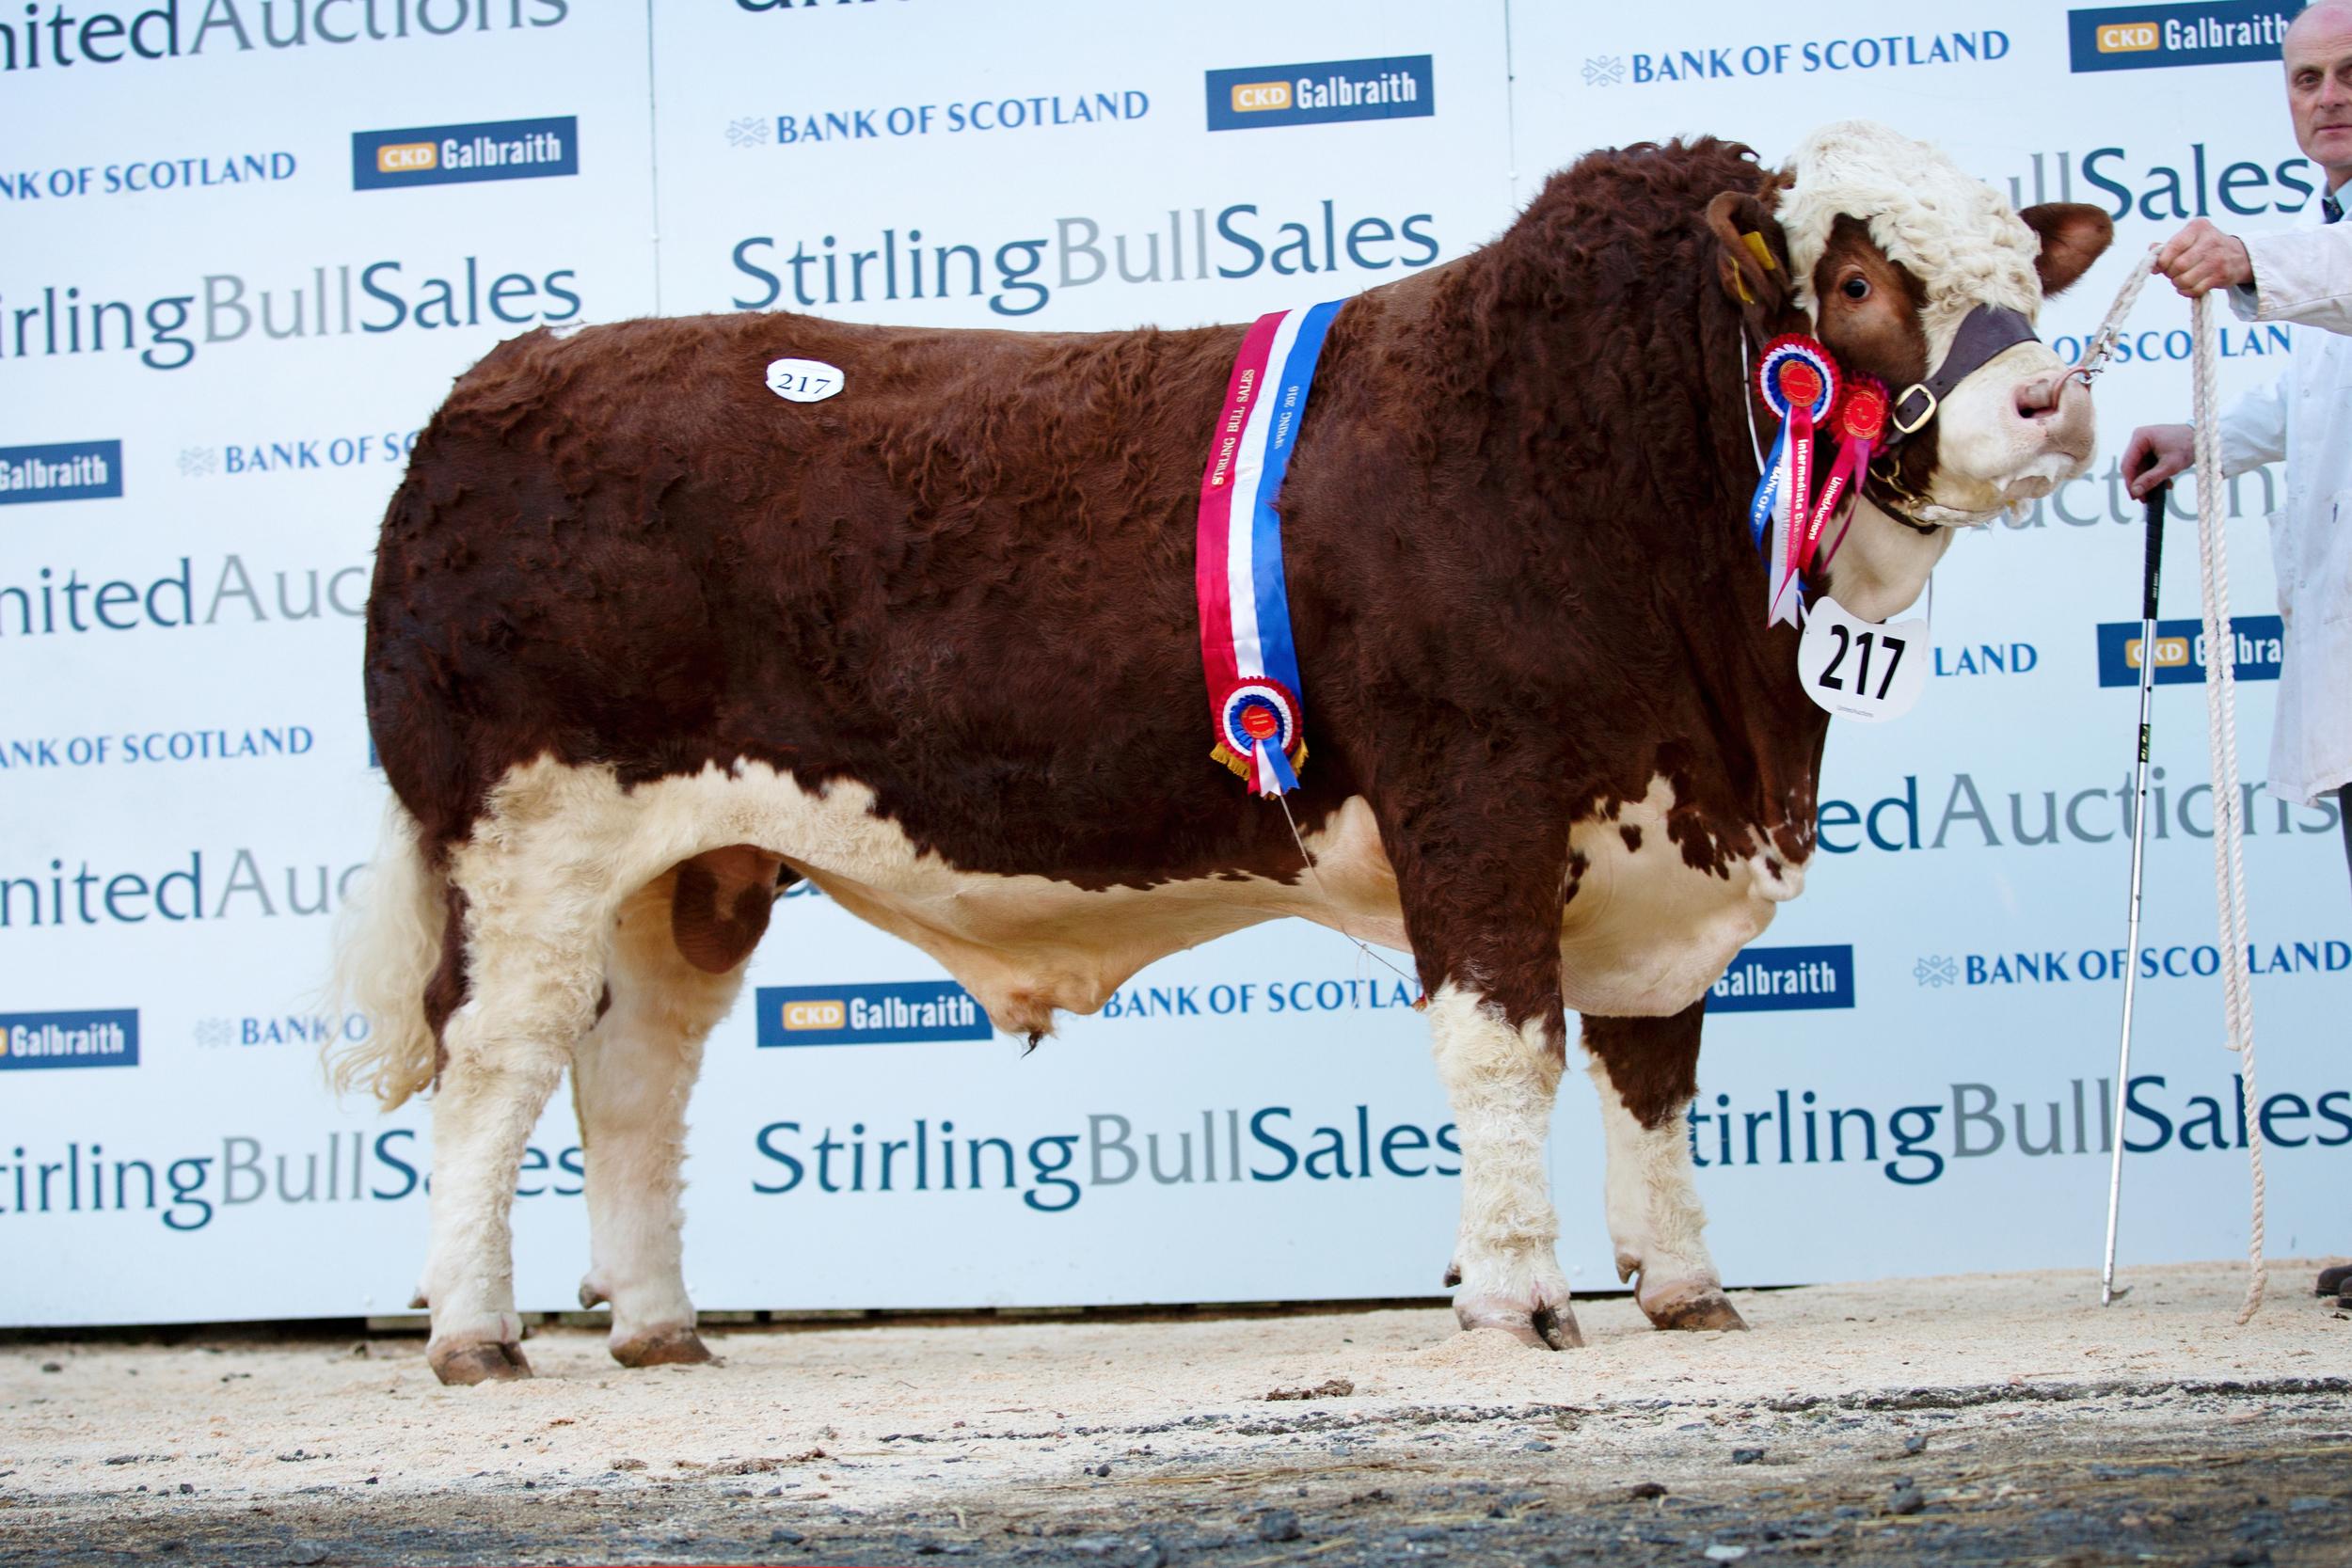 217-Kilbride-Farm-Foreman-22,000gns-4813.jpg